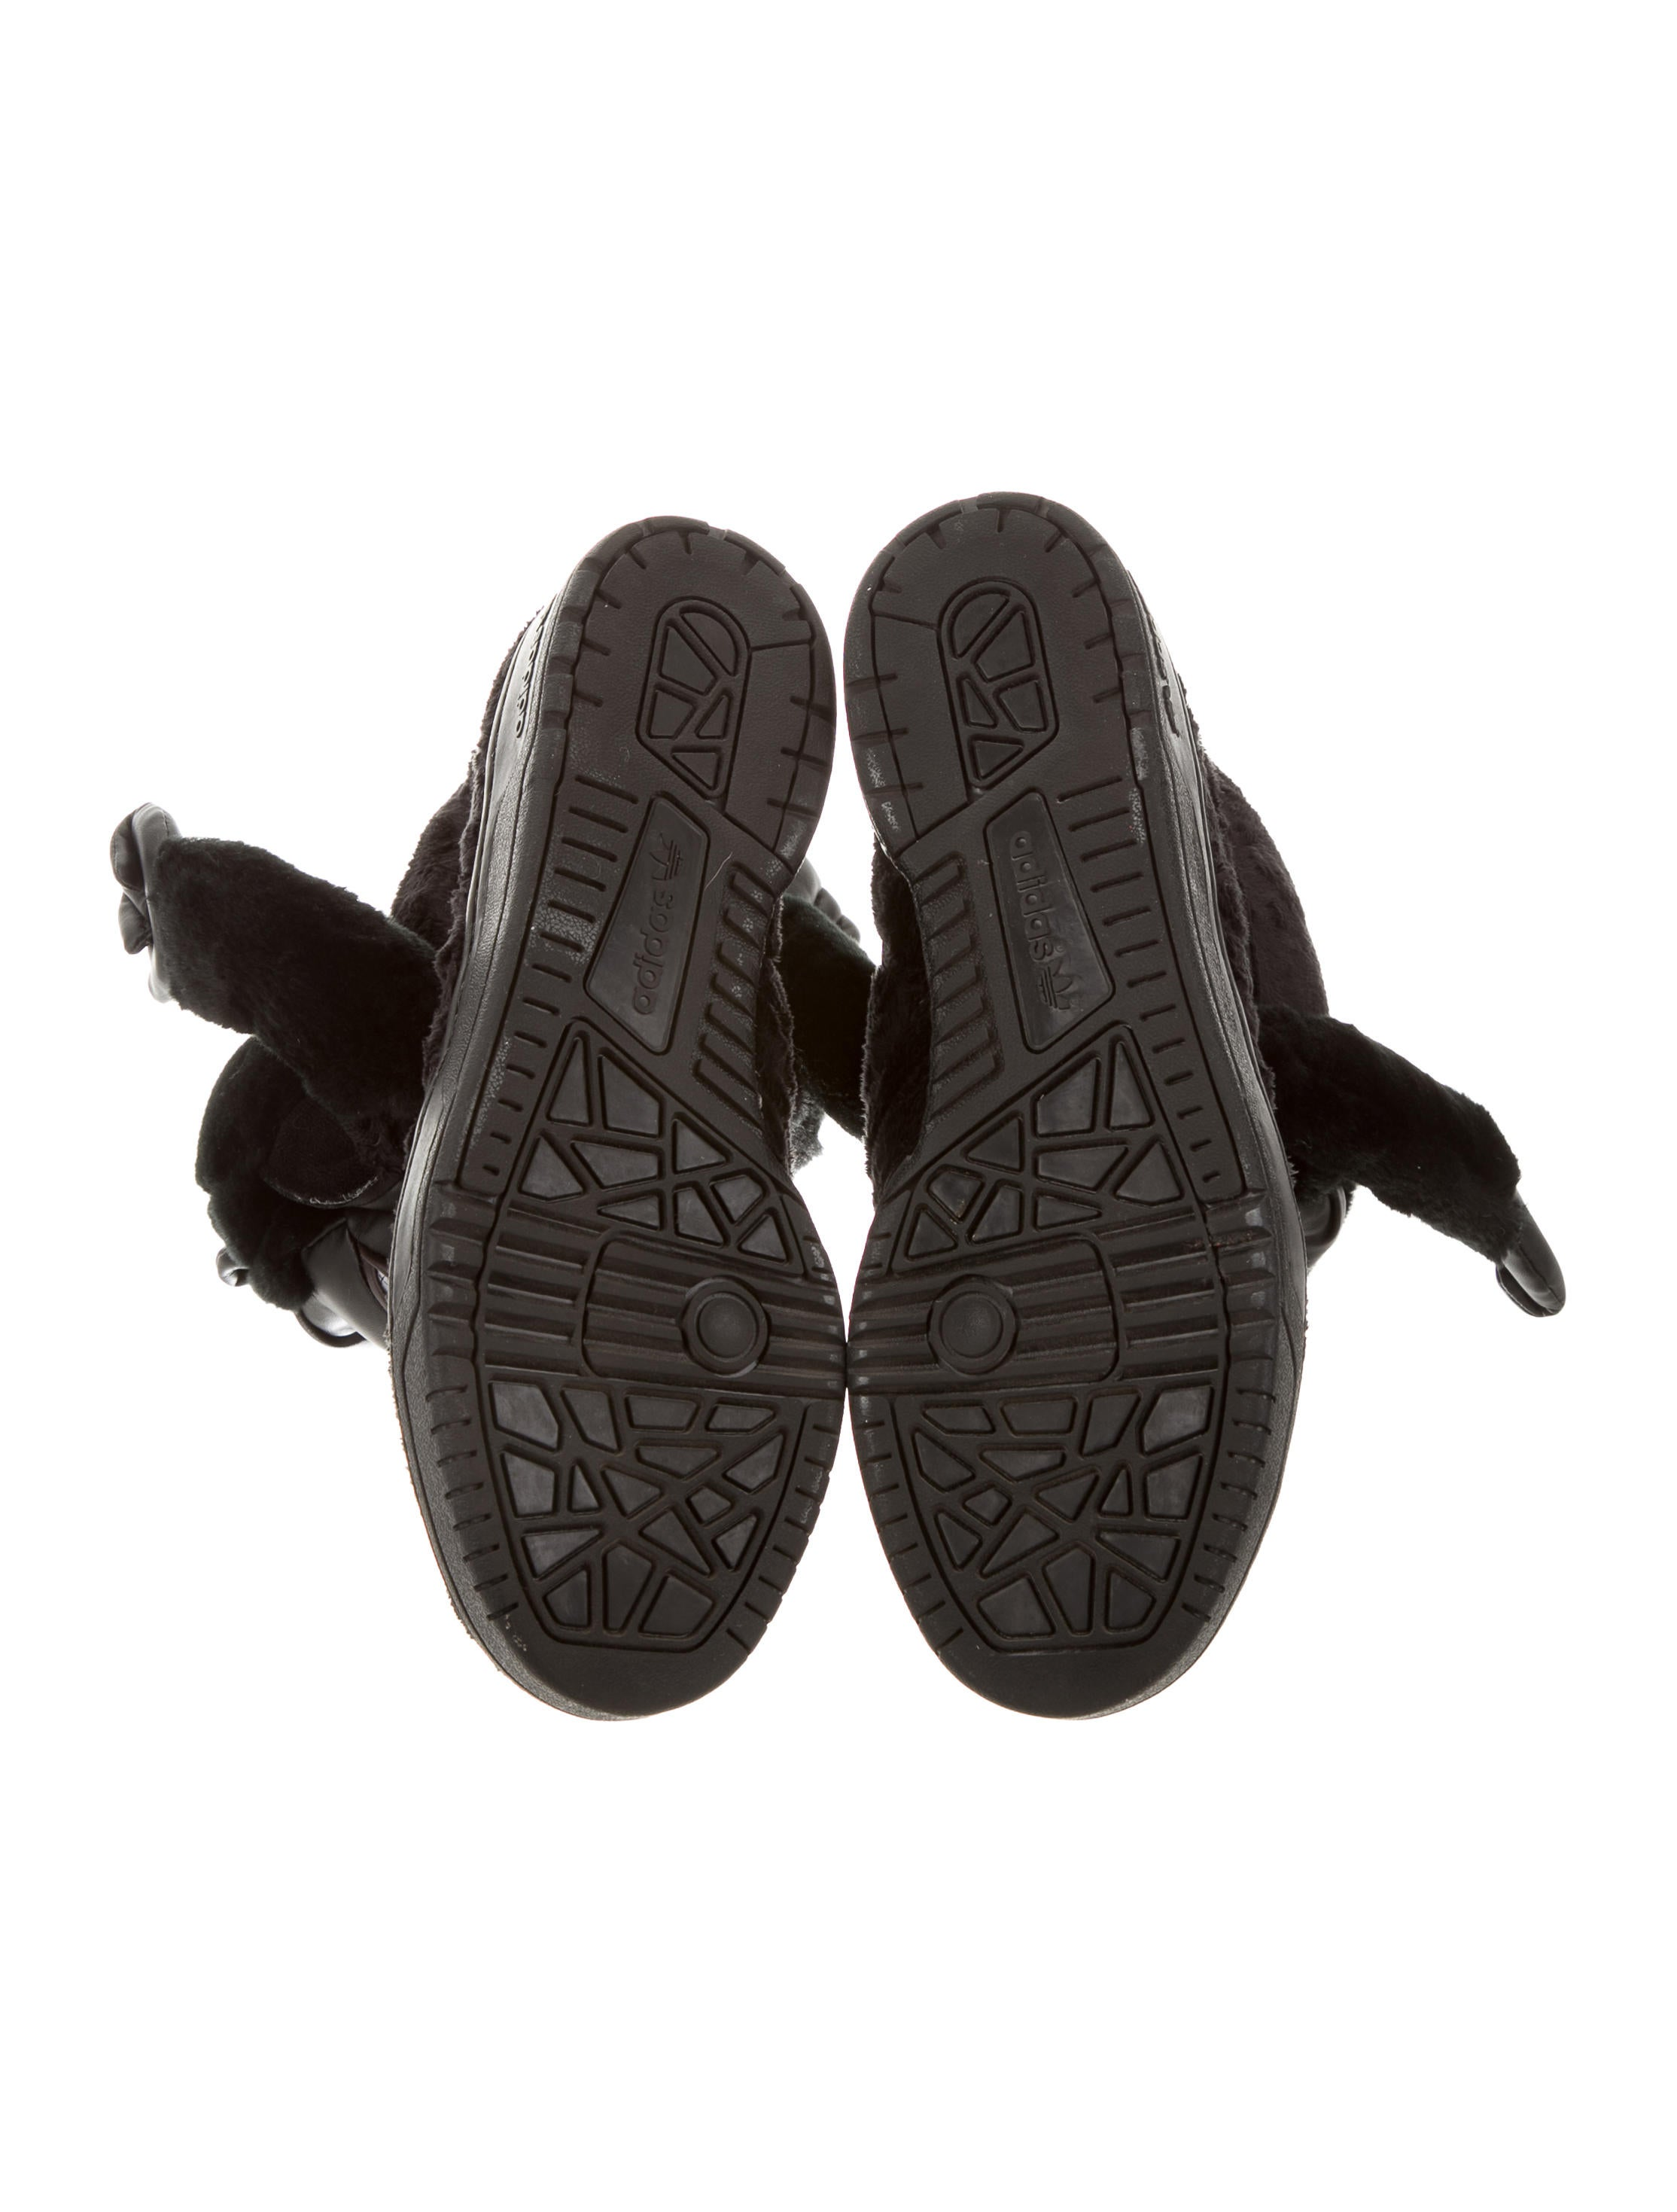 adidas gorilla sneakers